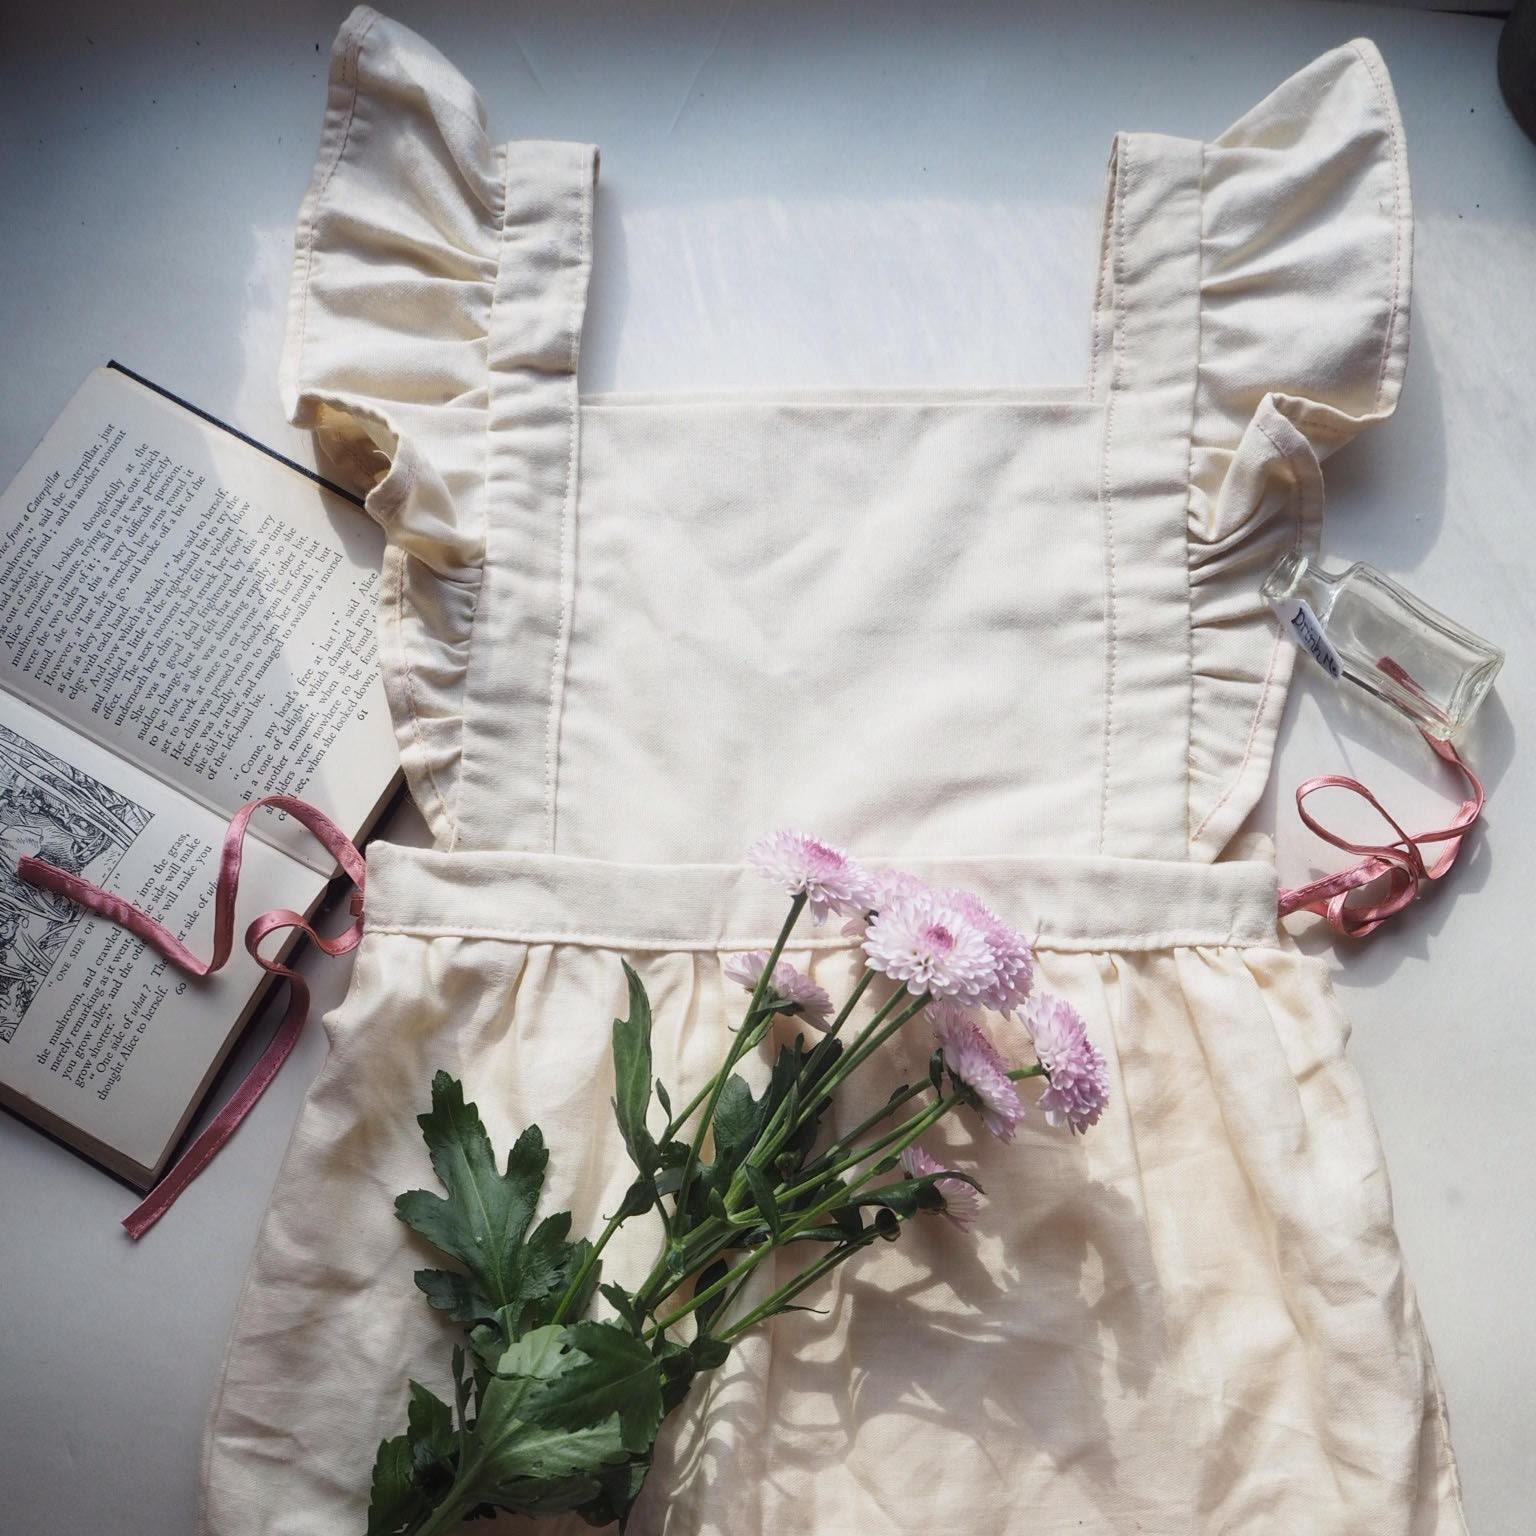 Girls birthday party dress Alice in Wonderland fairy princess pinafore vintage flower girl photo shoot little house on the prairie dress.